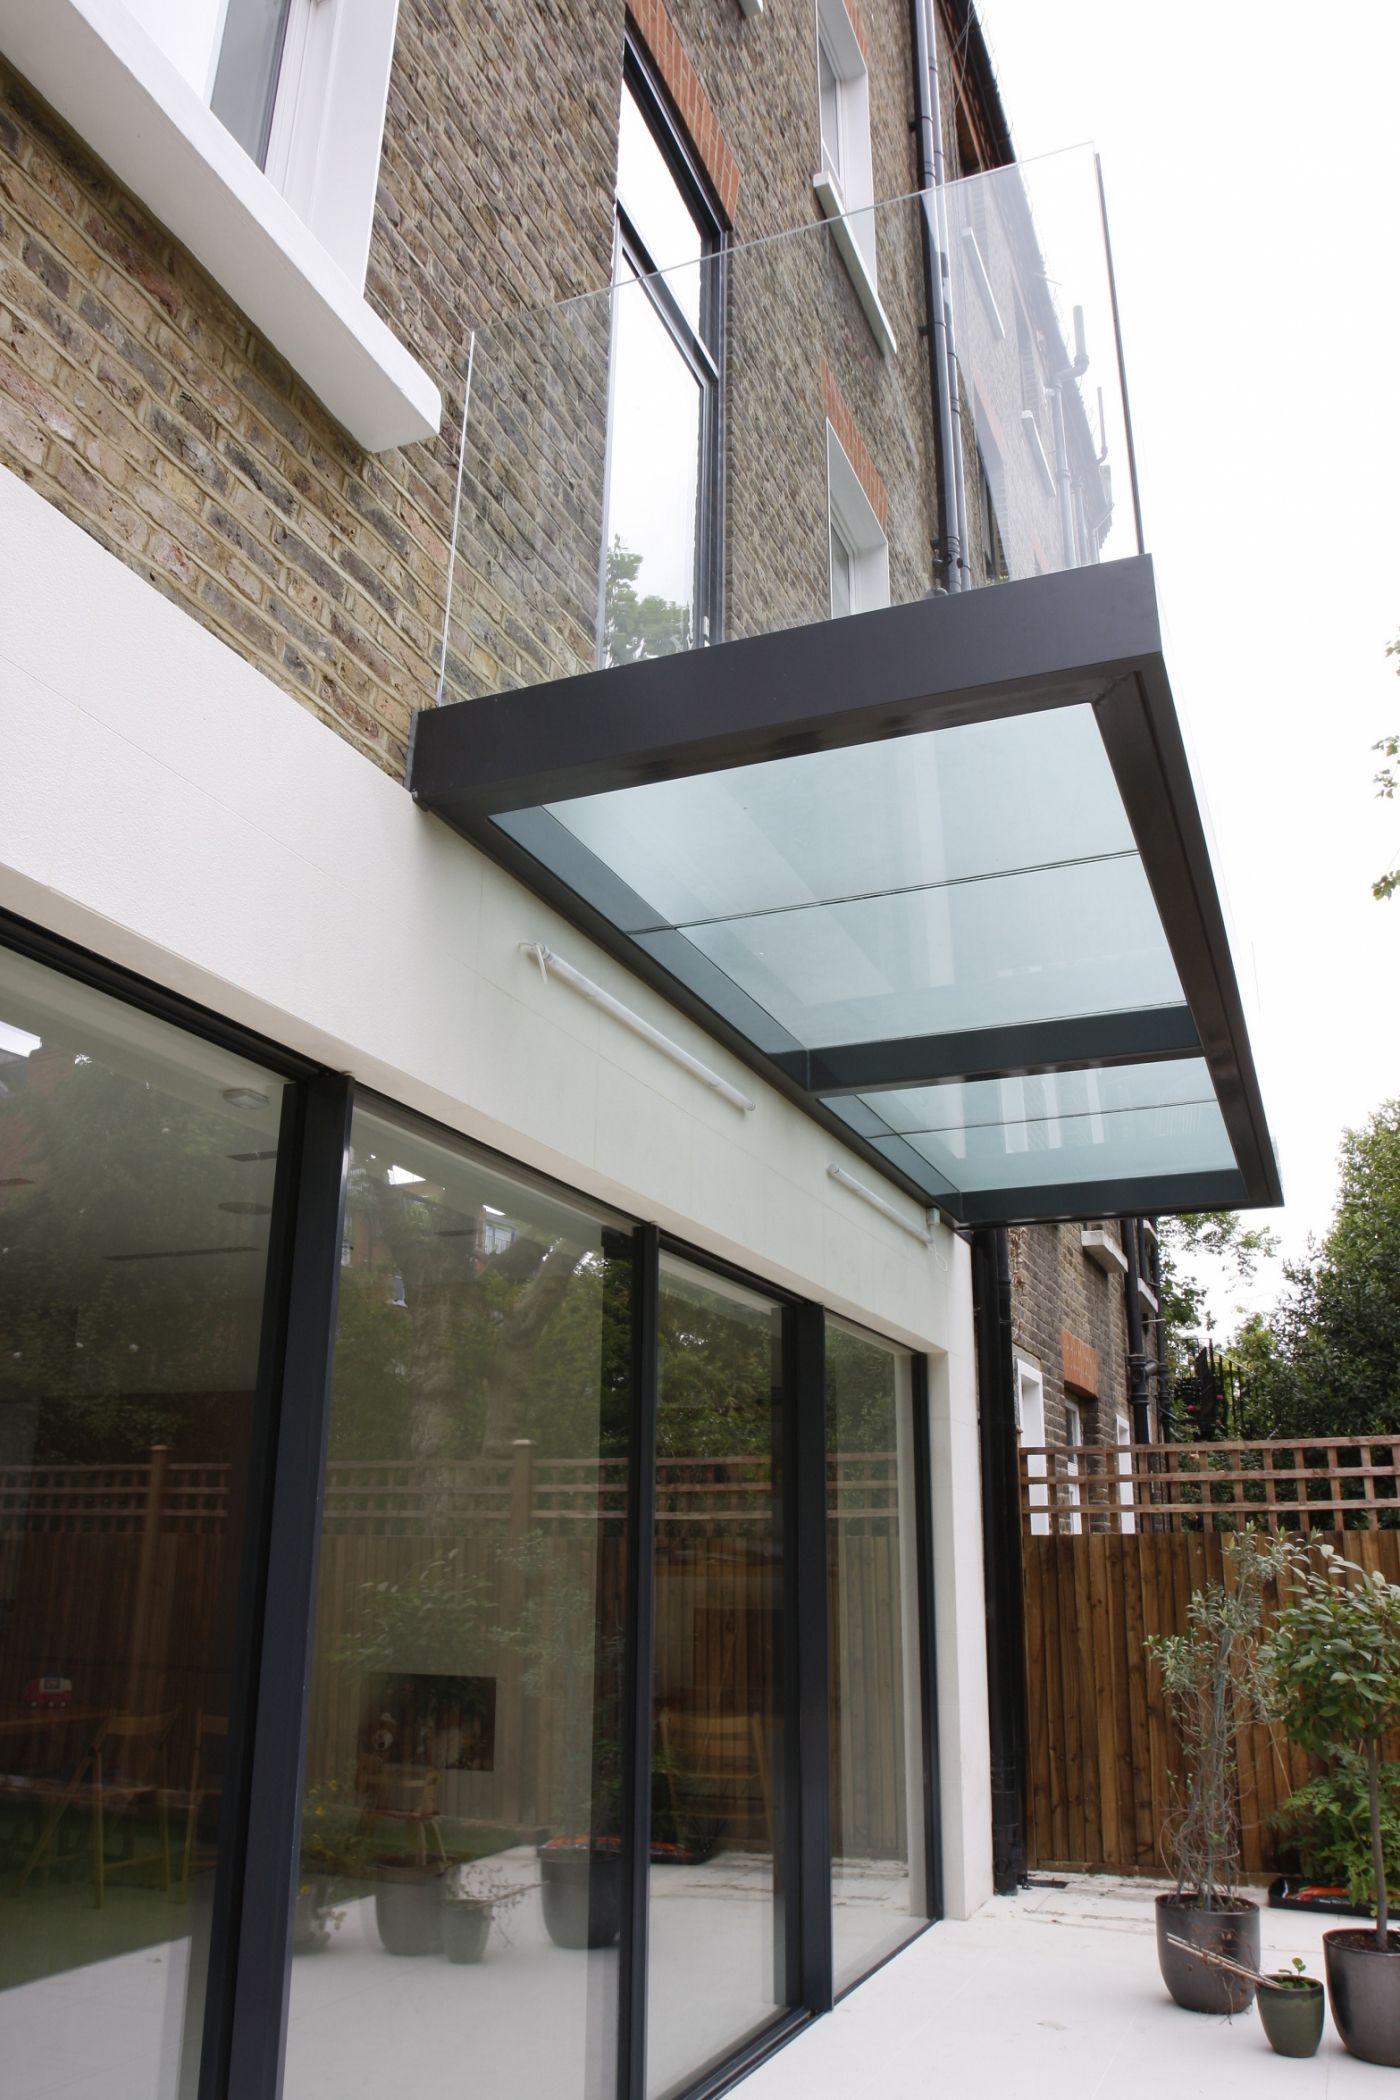 A Contemporary Renovation Using Minimally Framed Sliding Glass